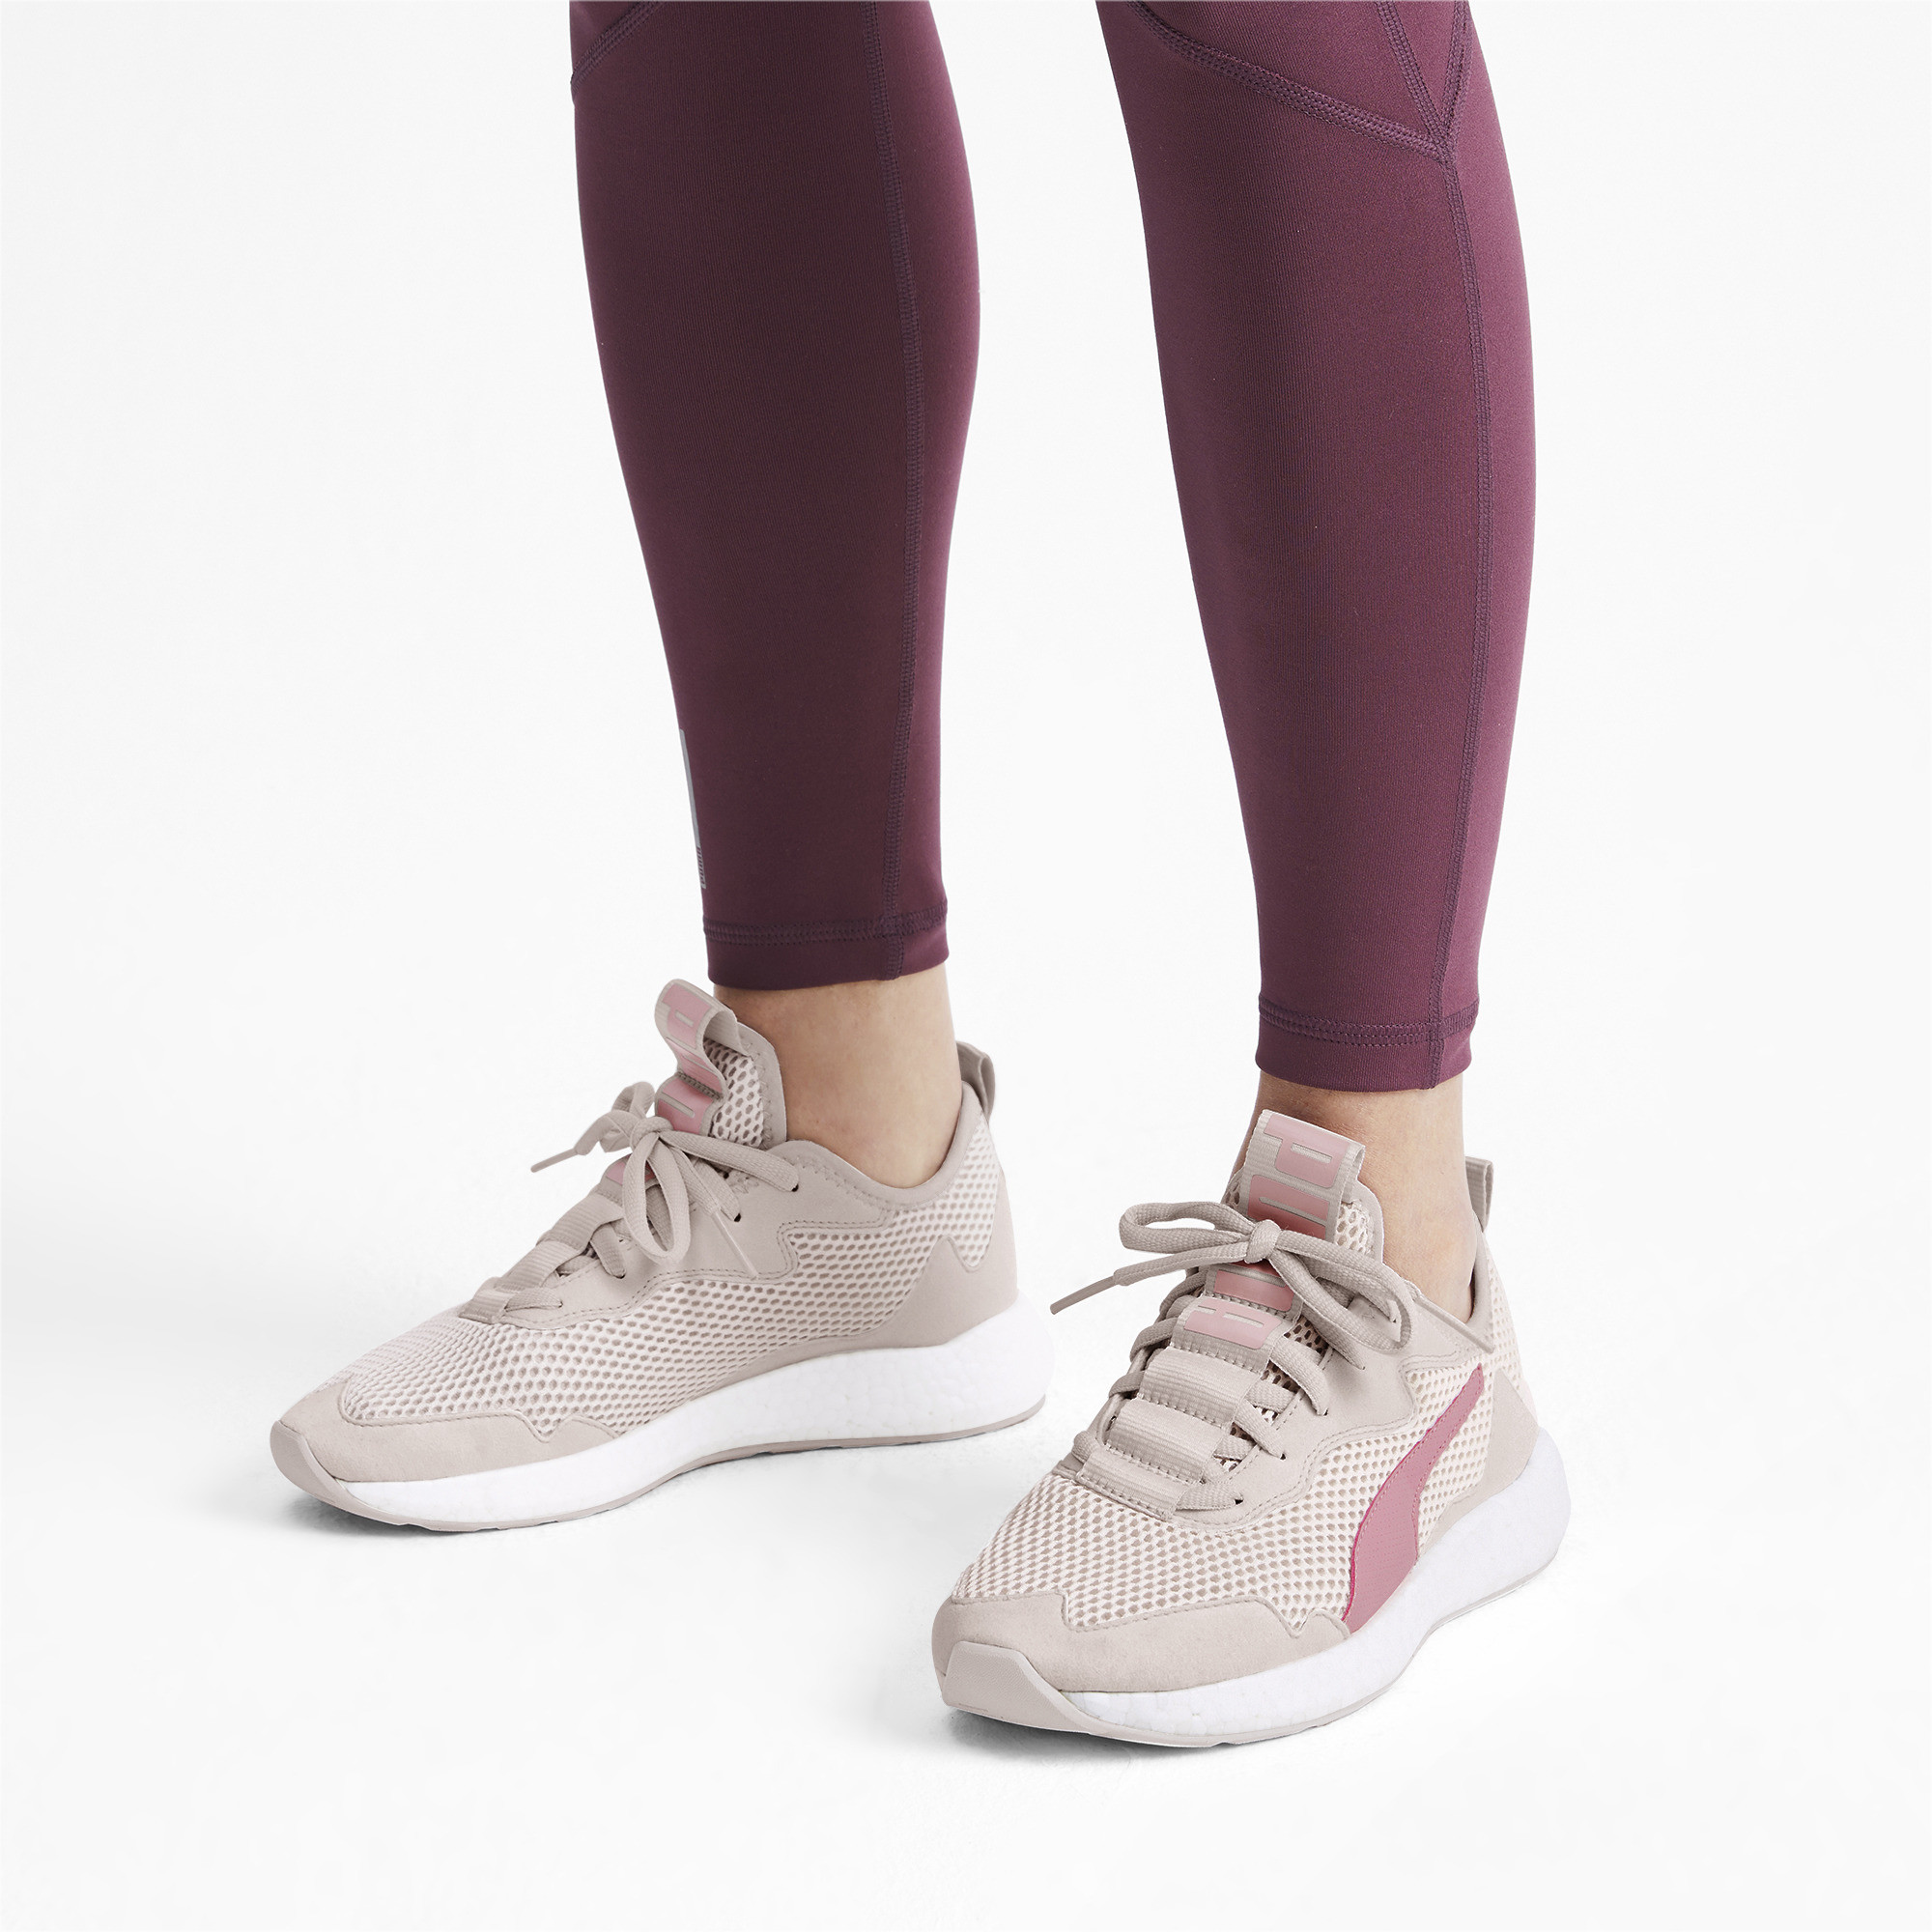 PUMA-Women-039-s-NRGY-Neko-Skim-Running-Shoes thumbnail 19